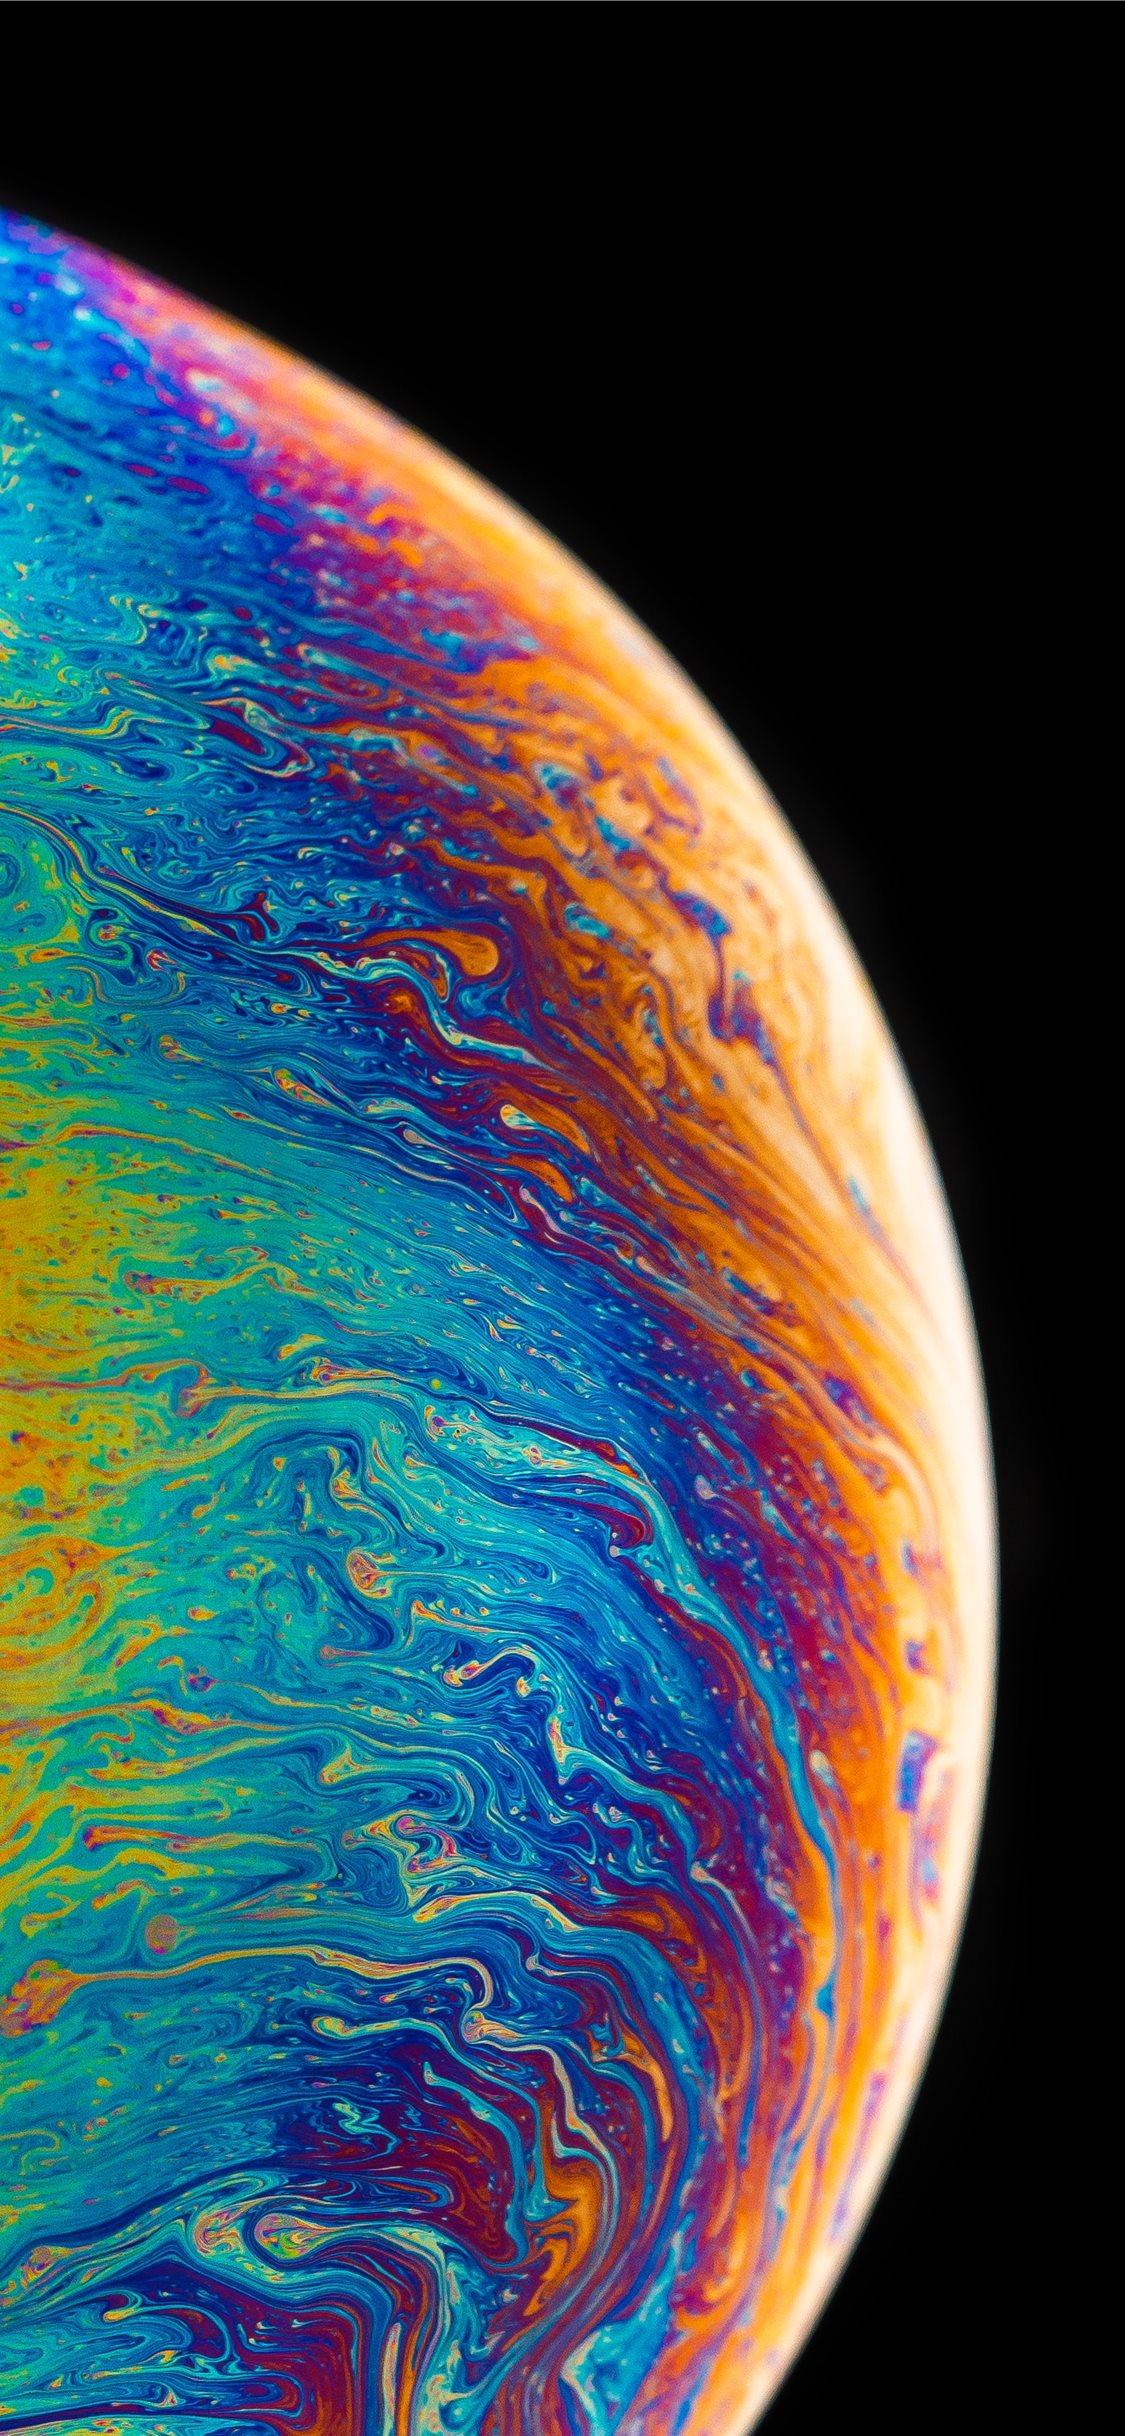 Iphone Planet Wallpaper 4k , HD Wallpaper & Backgrounds